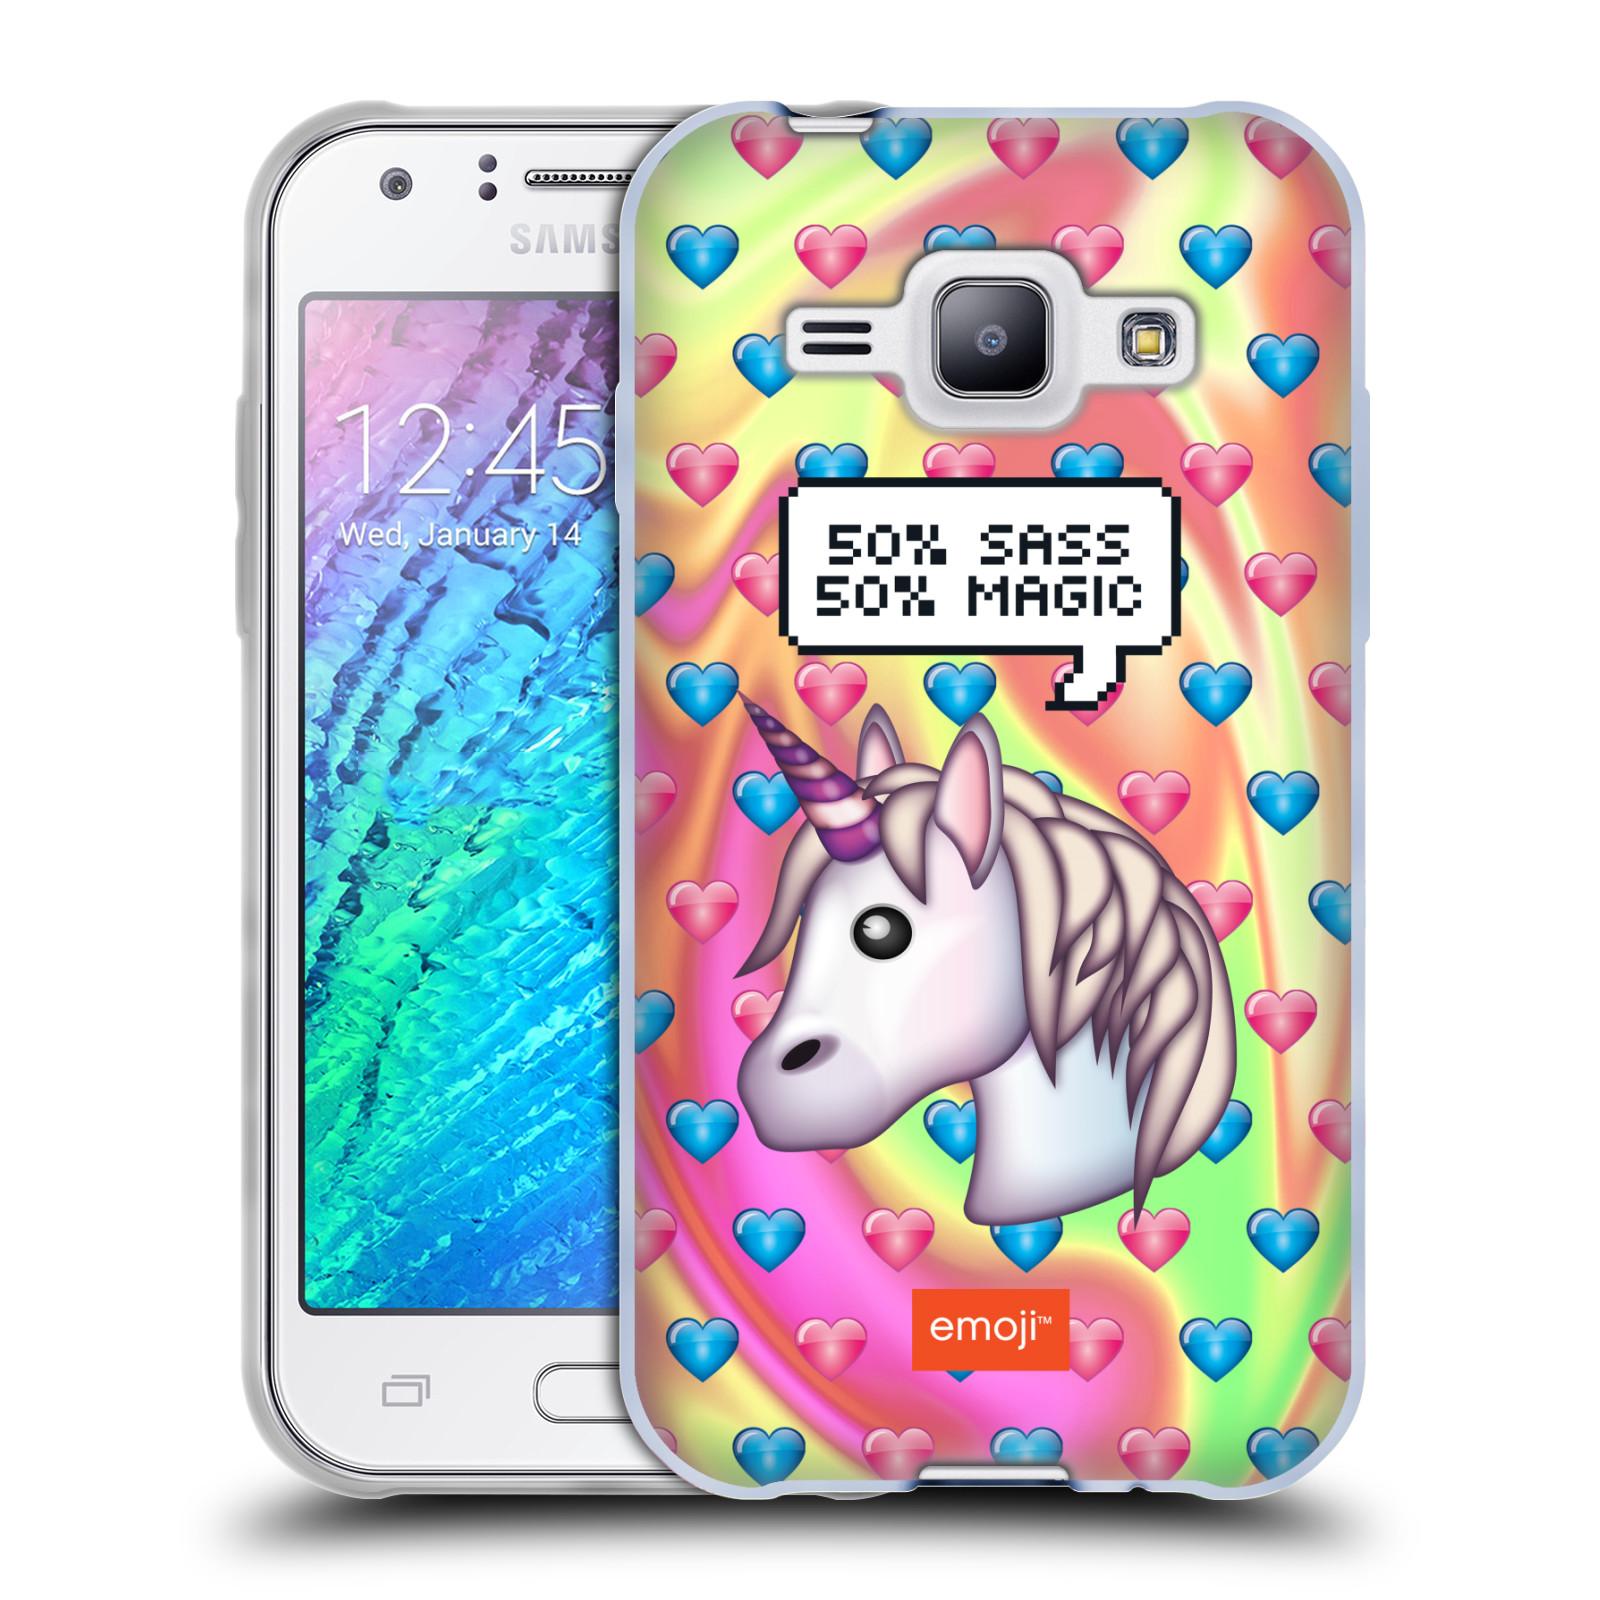 Silikonové pouzdro na mobil Samsung Galaxy J1 HEAD CASE EMOJI - Jednorožec (Silikonový kryt či obal s oficiálním motivem EMOJI na mobilní telefon Samsung Galaxy J1 a J1 Duos)